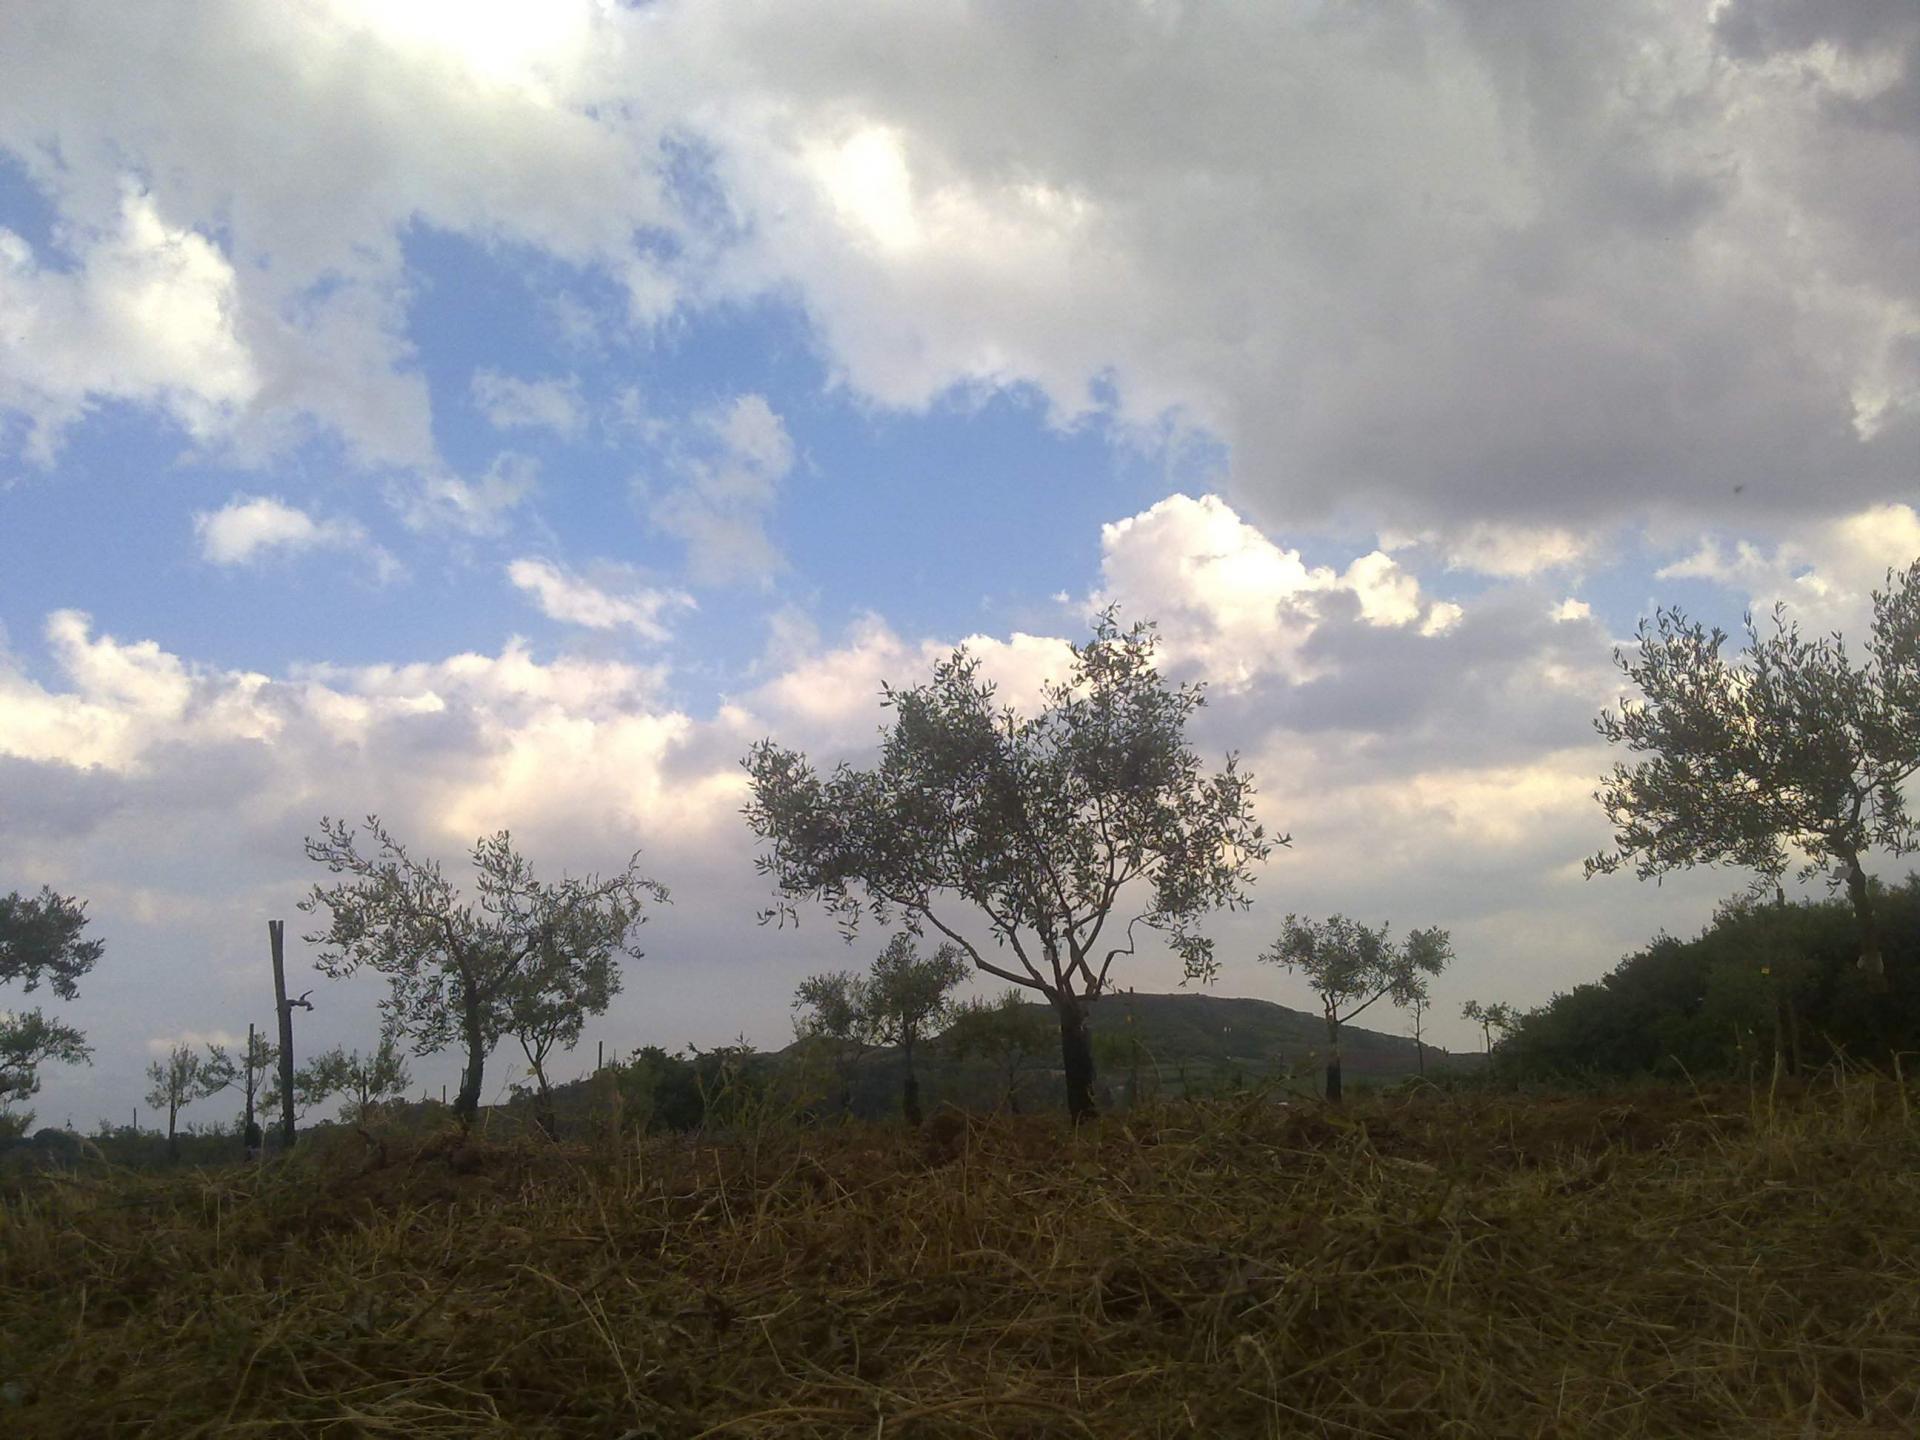 Olivo, albero essenziale